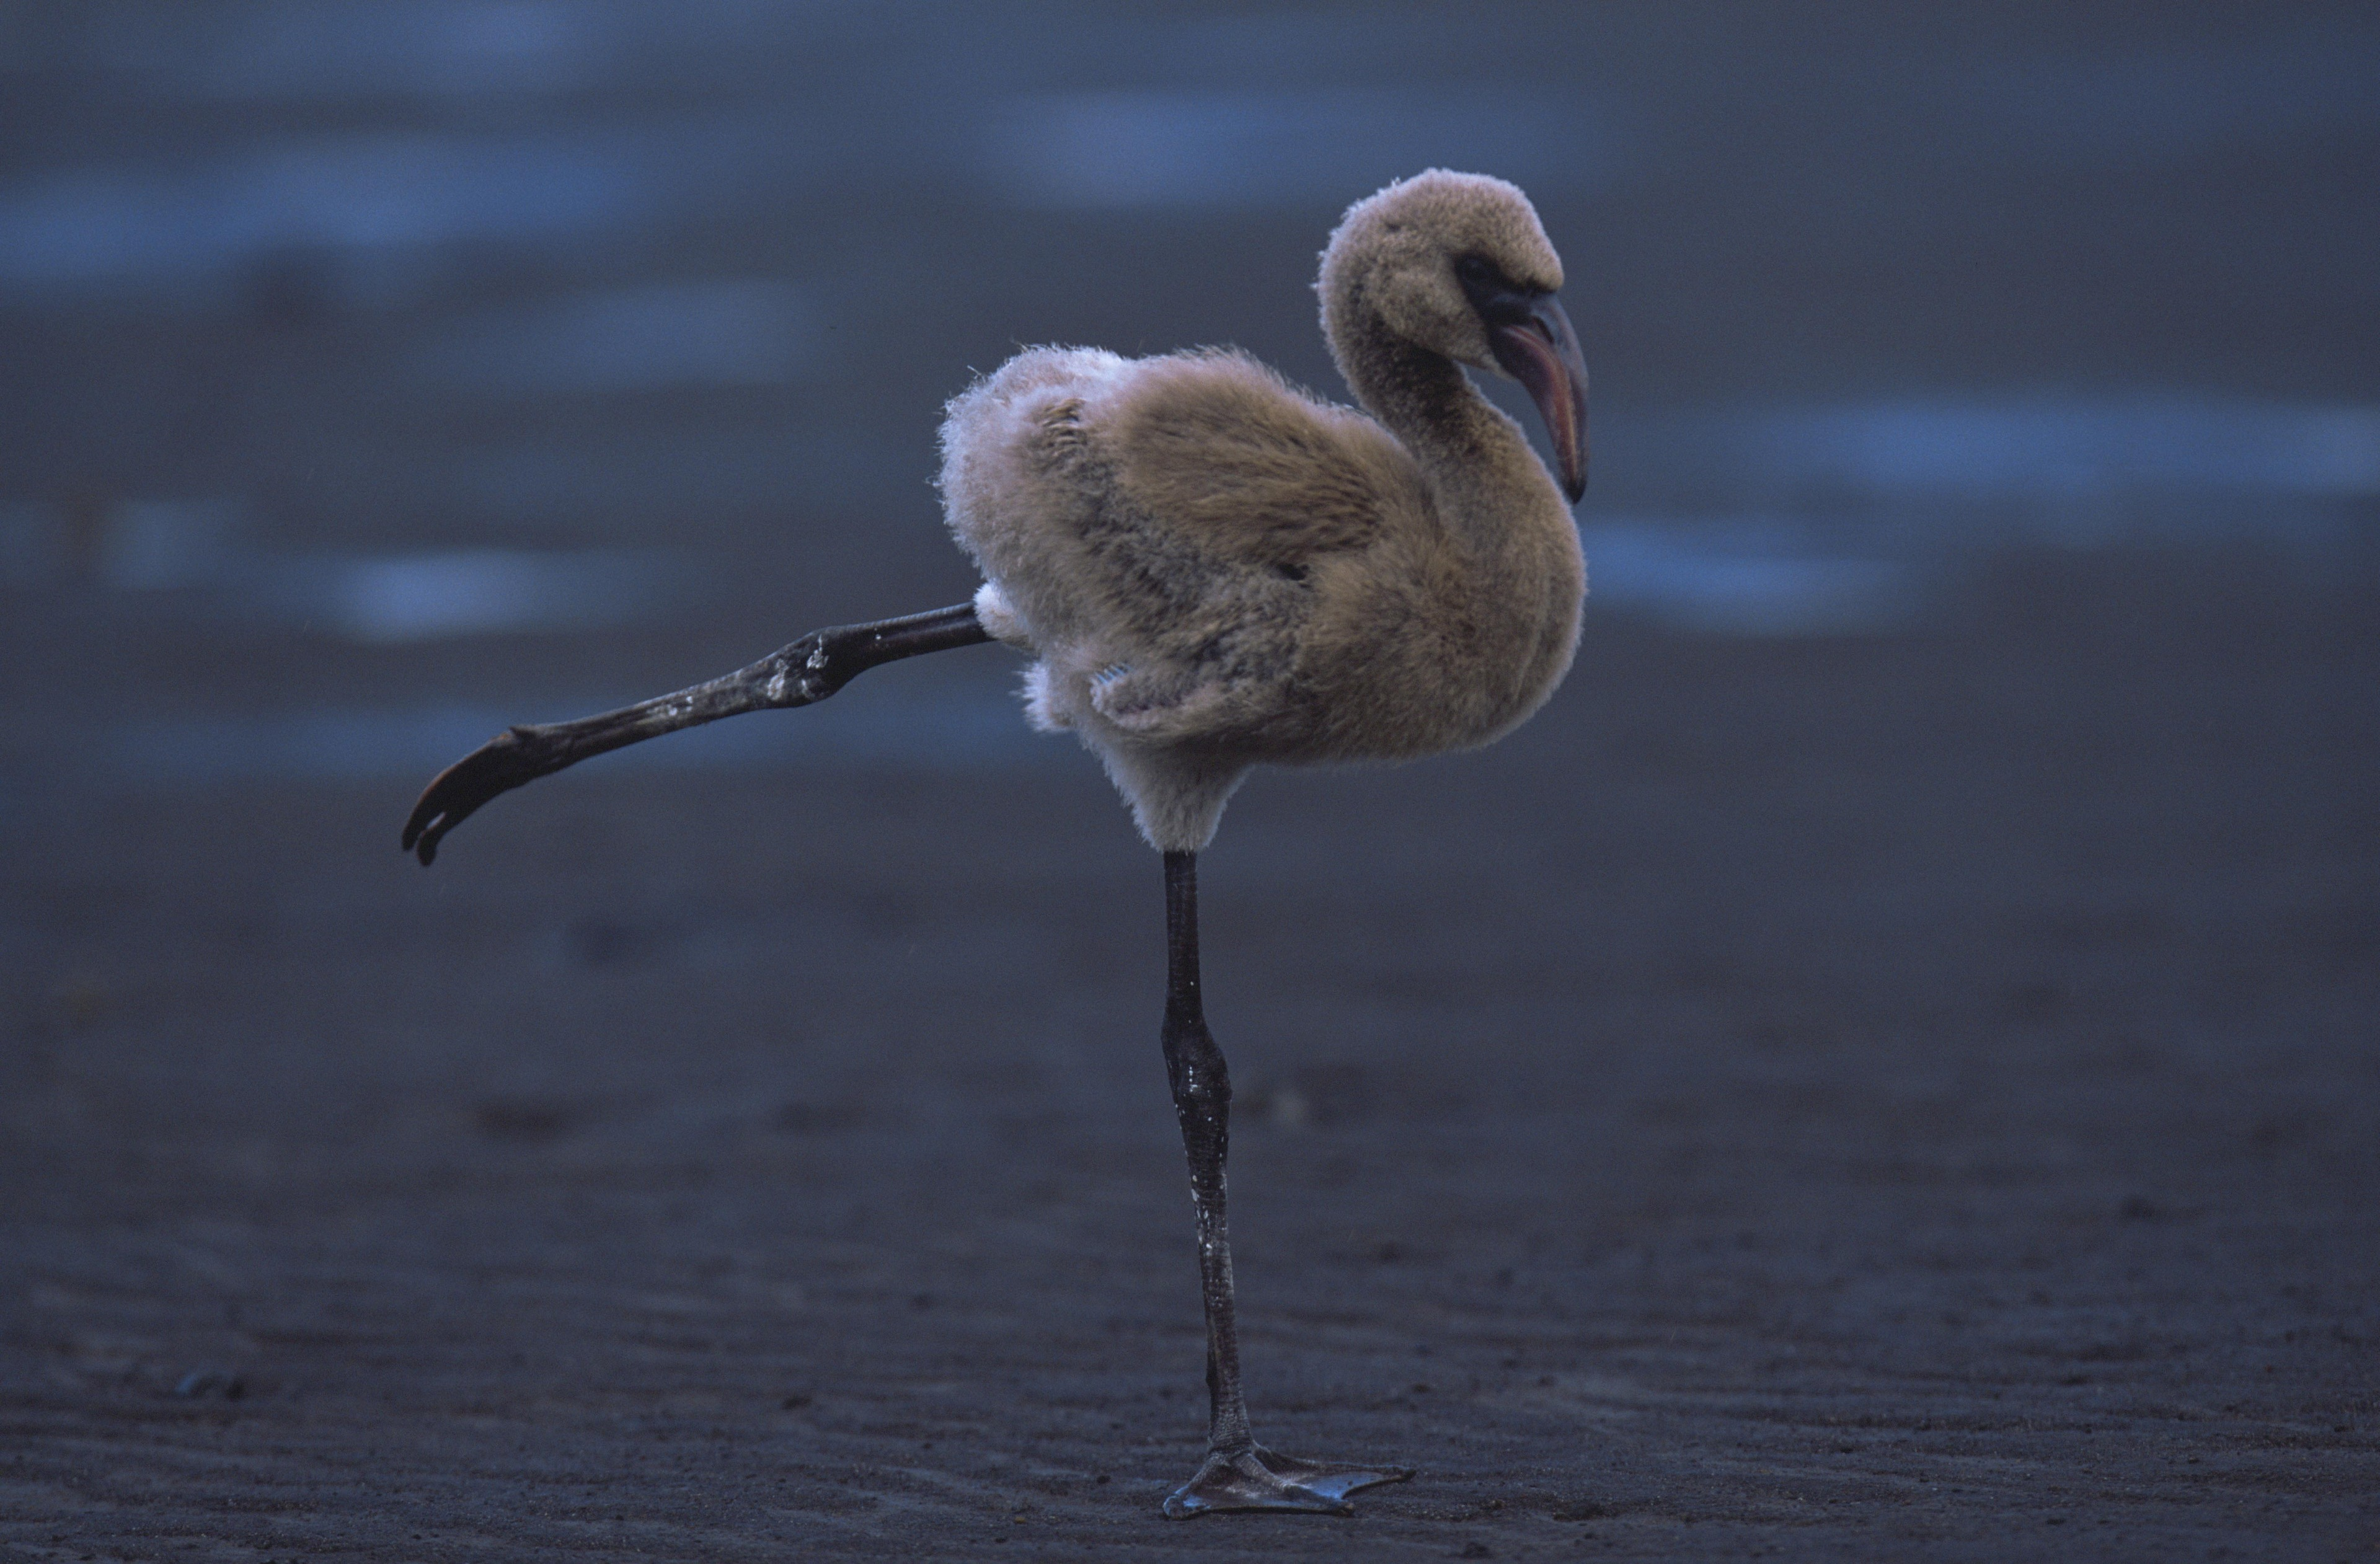 A flamingo gracefully balances before flight.